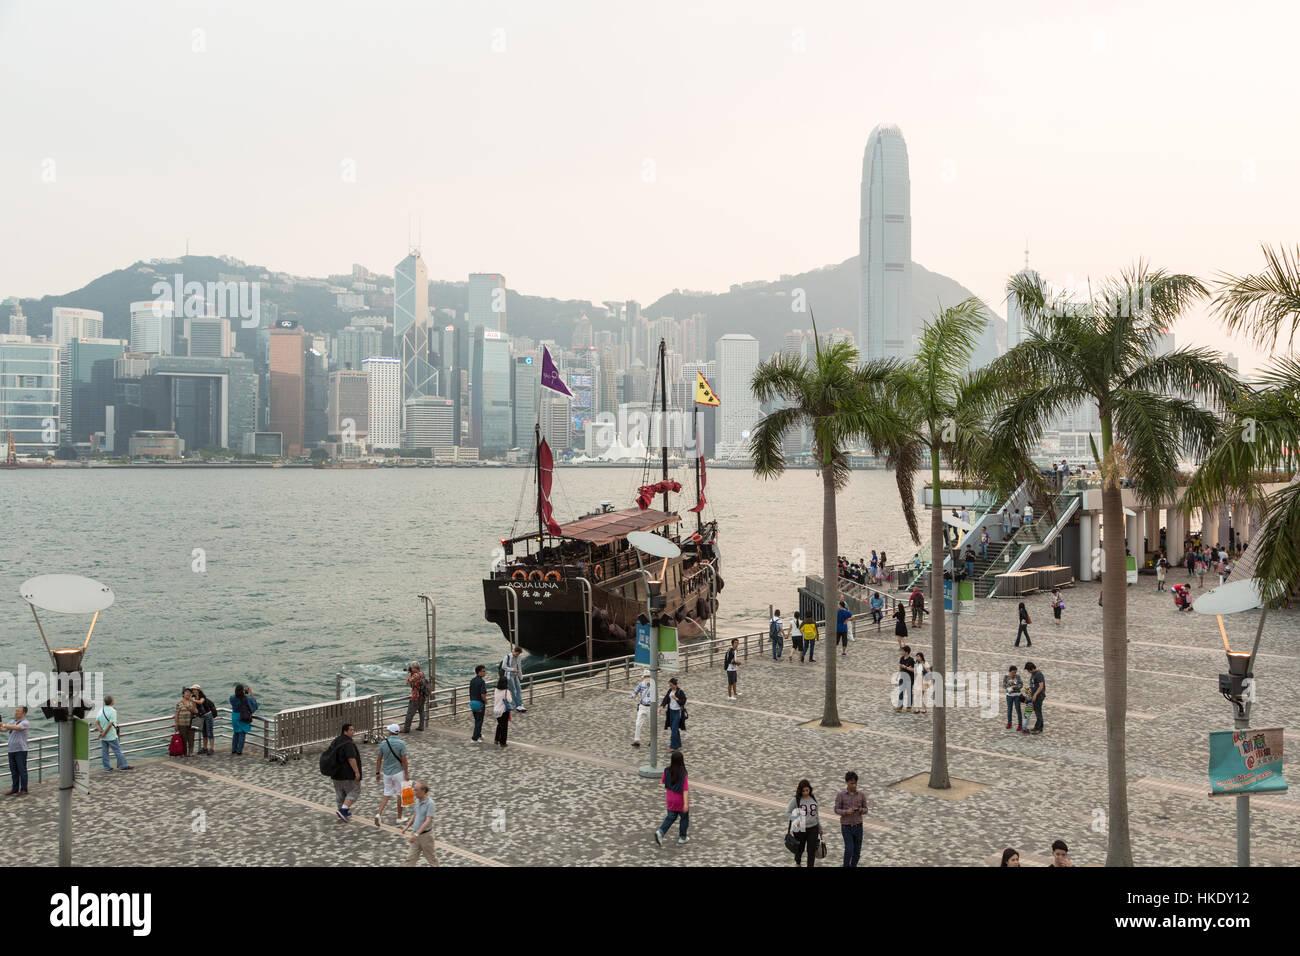 Hong Kong, Hong Kong - 26. April 2015: Touristen fotografieren und genießen Sie die berühmte Skyline von Stockbild